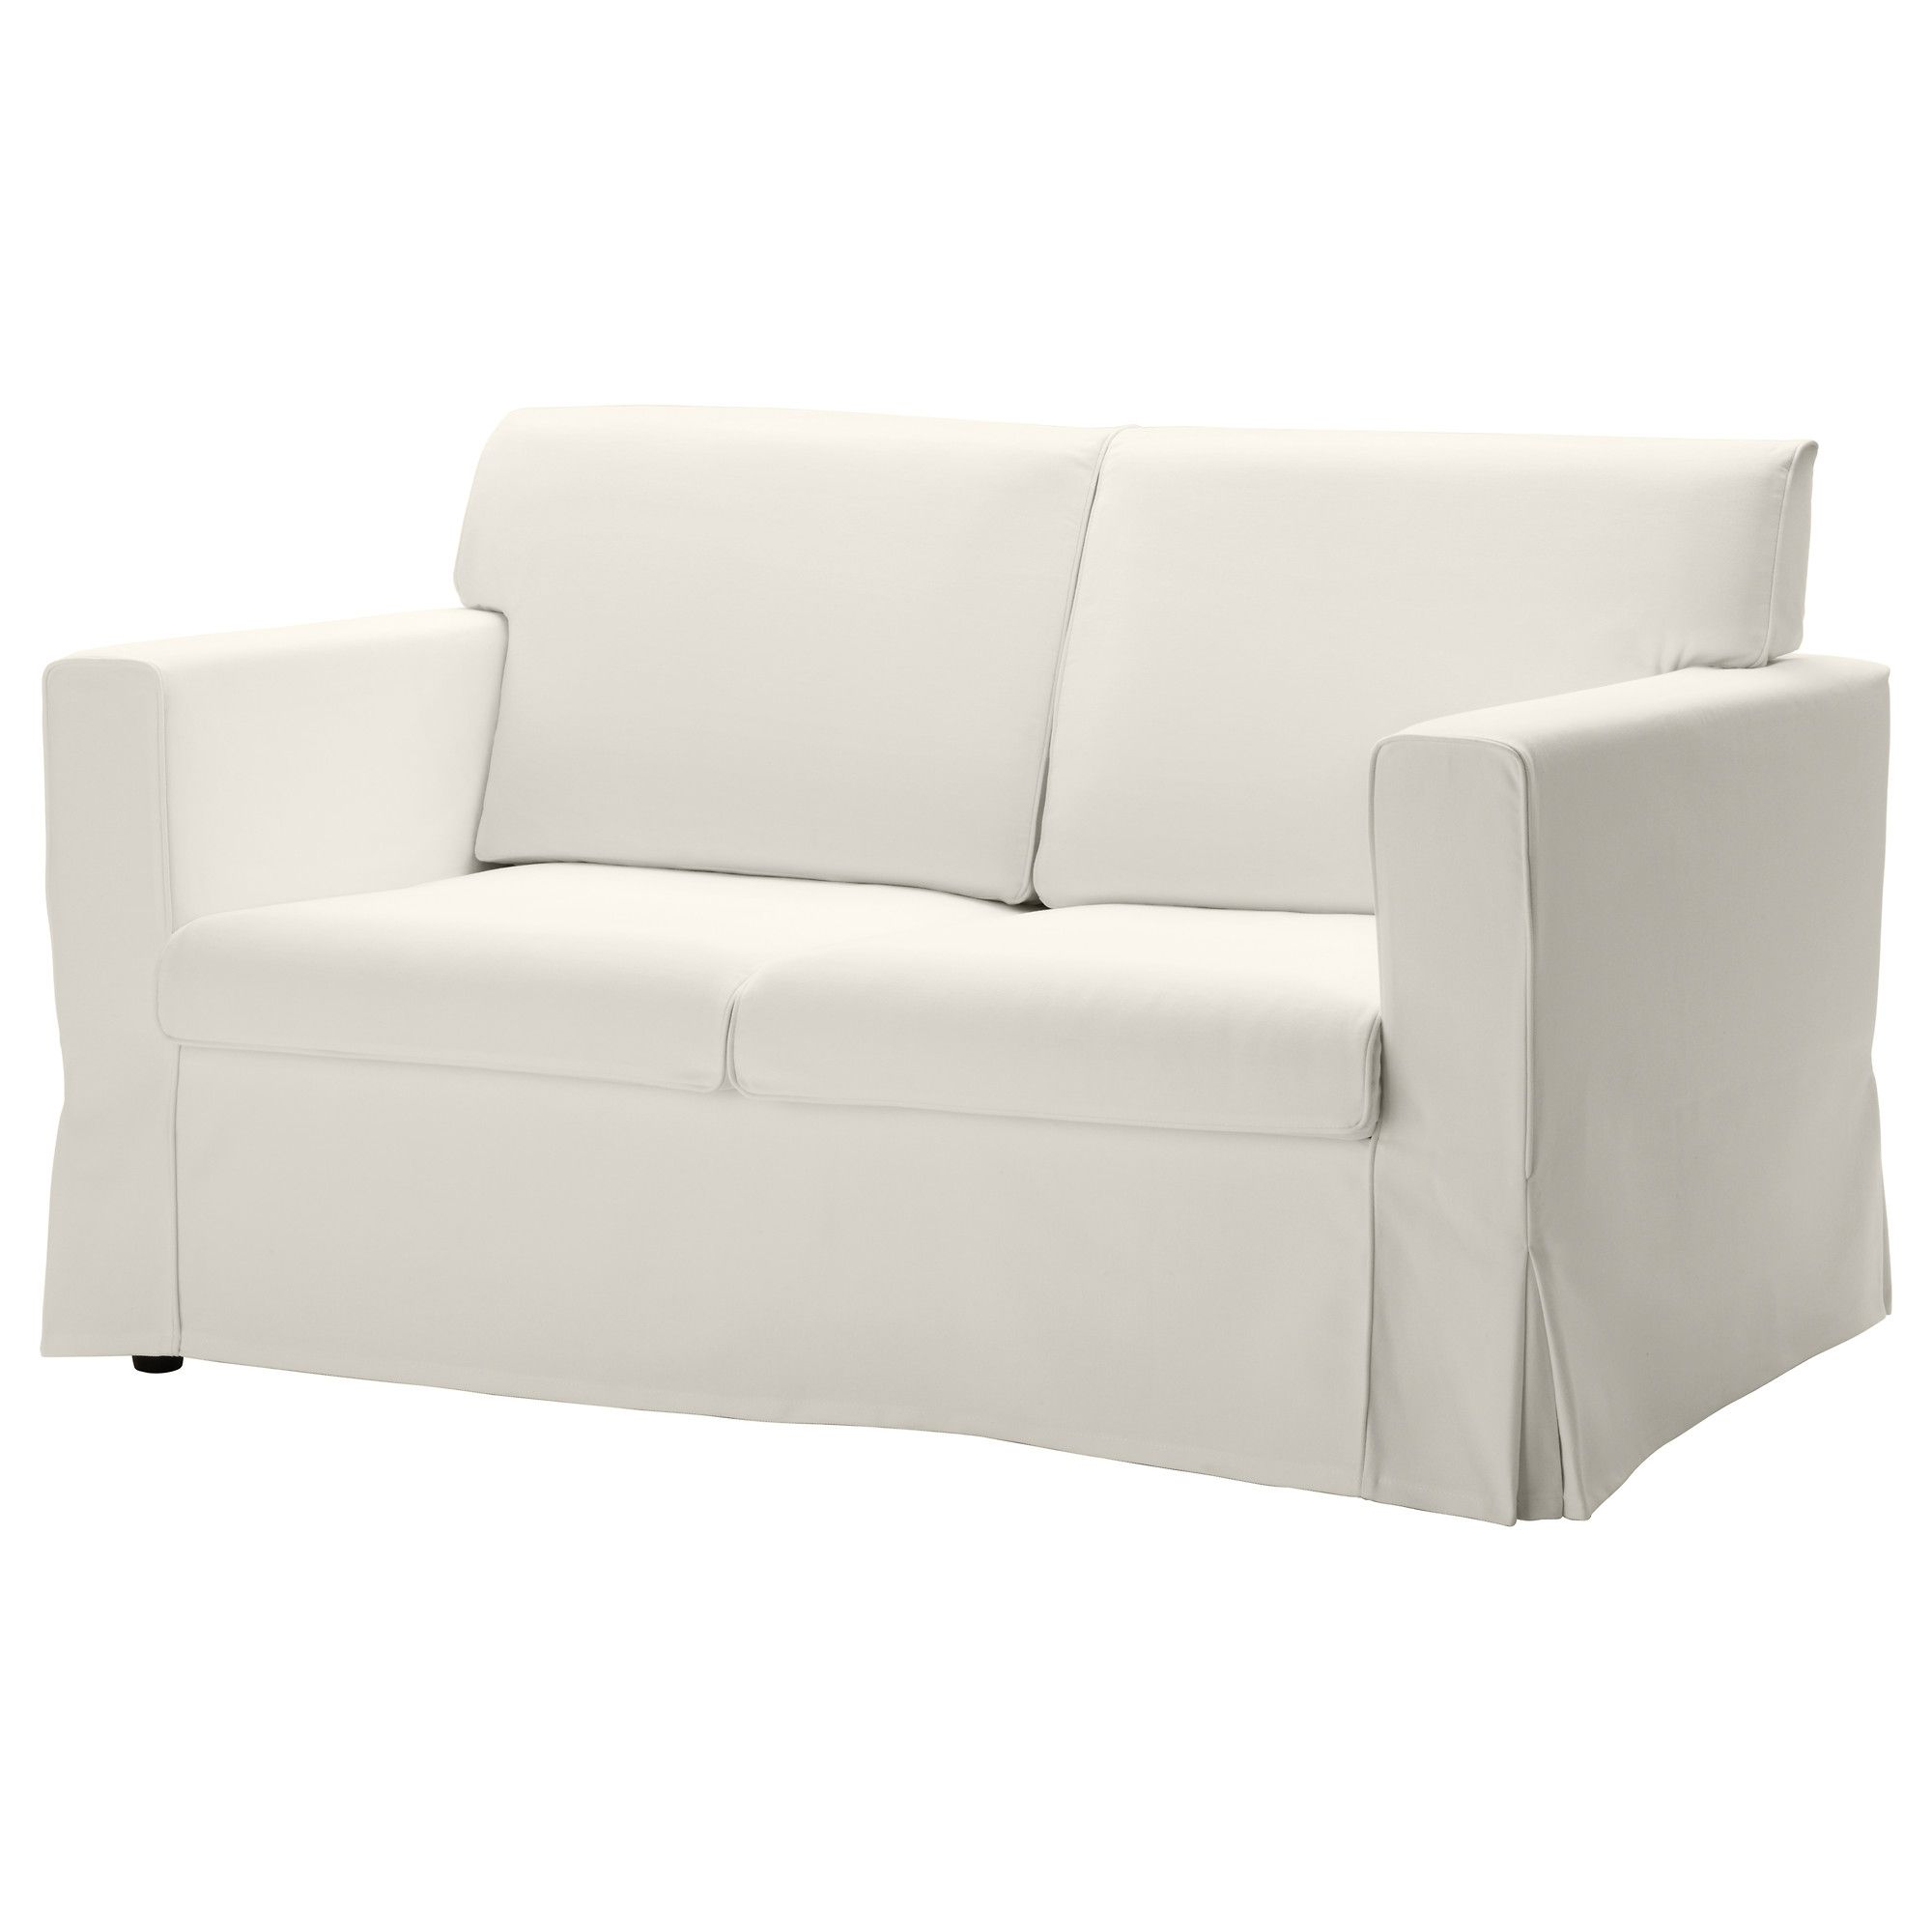 2er sofa ikea  SANDBY 2er-Sofa - Blekinge weiß - IKEA €219   wohnung_sofa ...